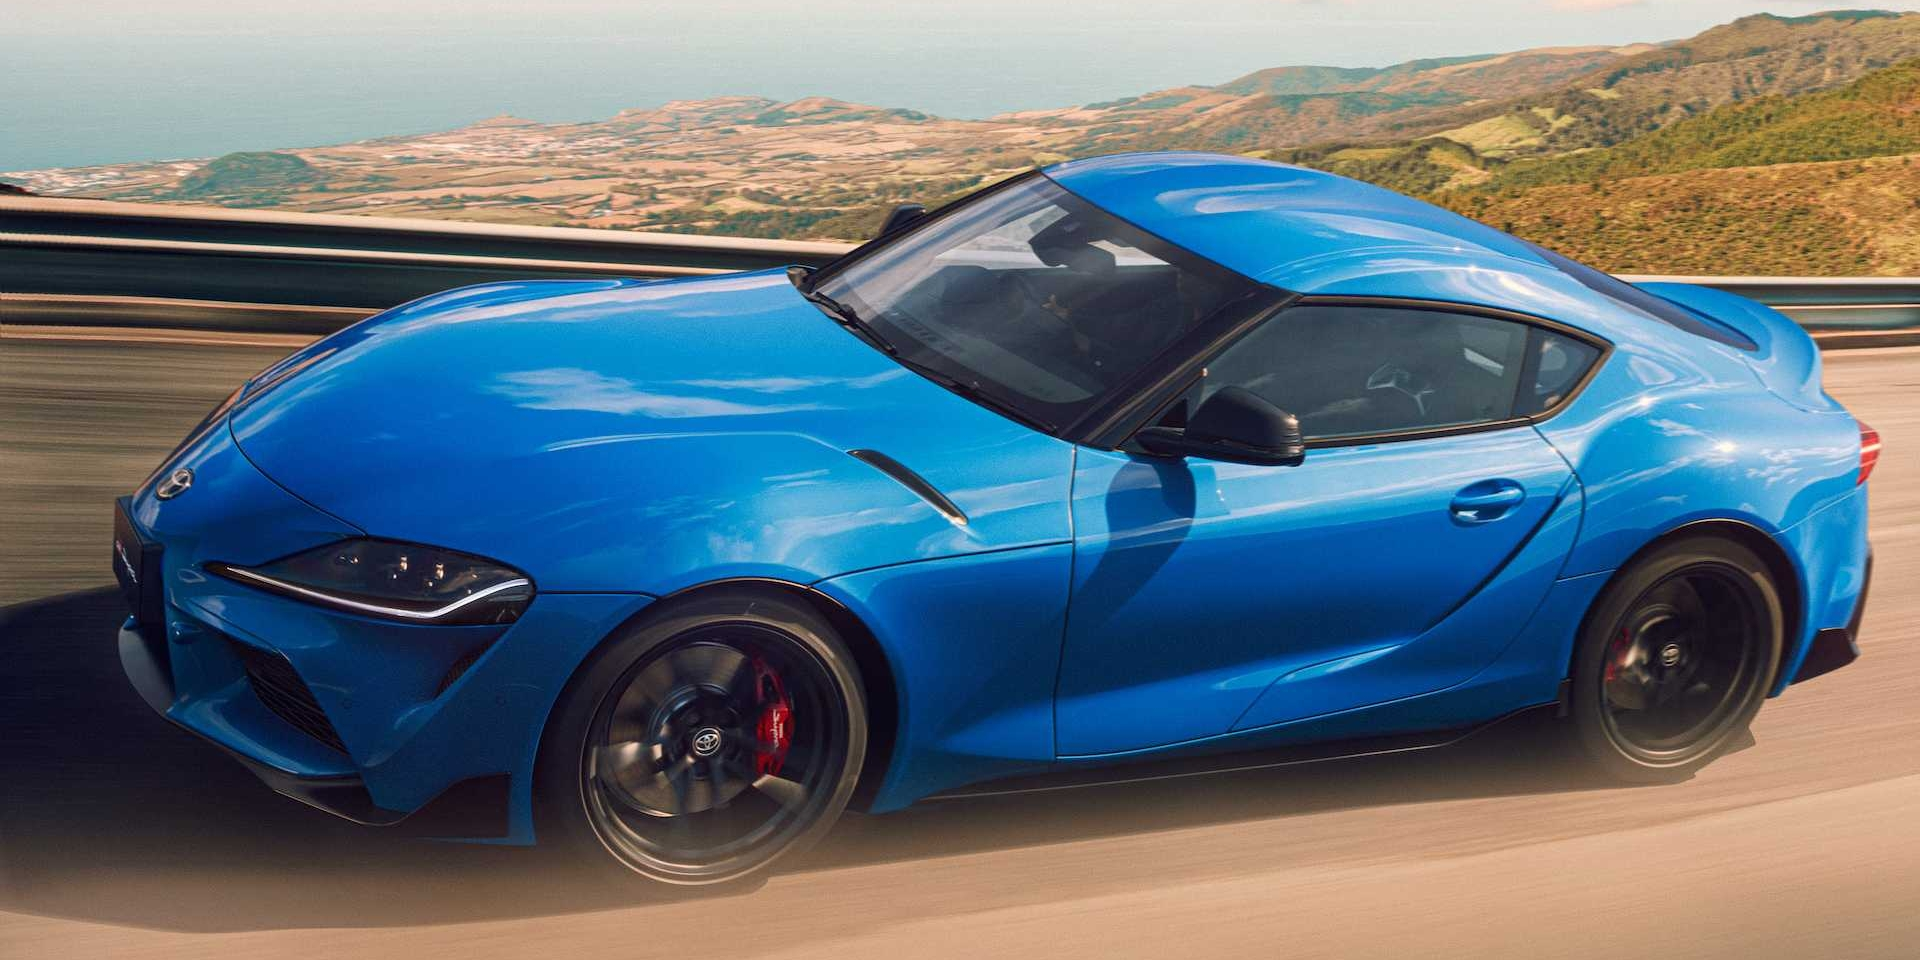 Toyota Supra限量Horizon Blue版本 動力更強!加速更快!